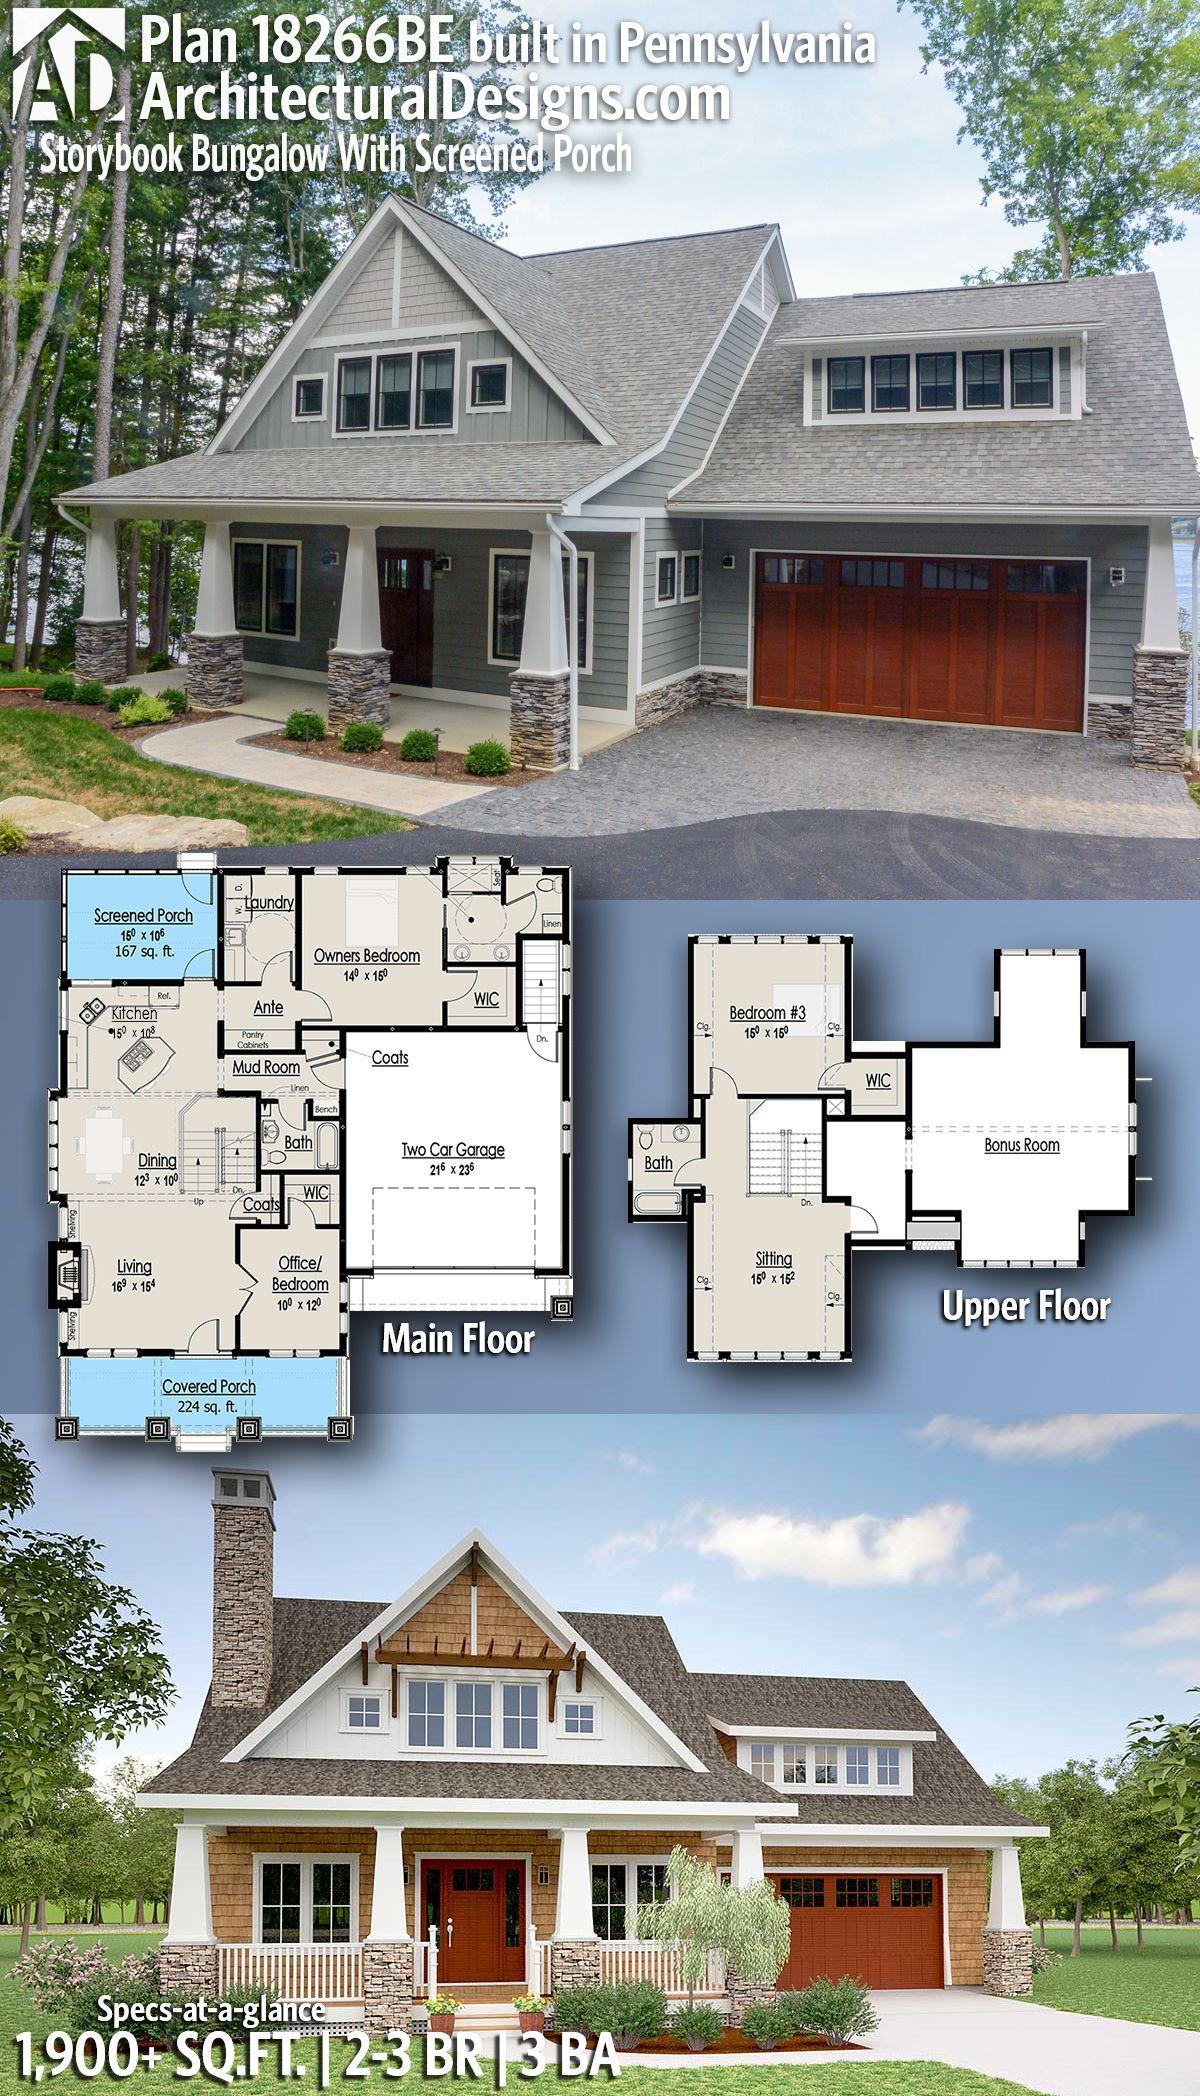 Architectural Designs Storybook Craftsman House Plan 18266BE